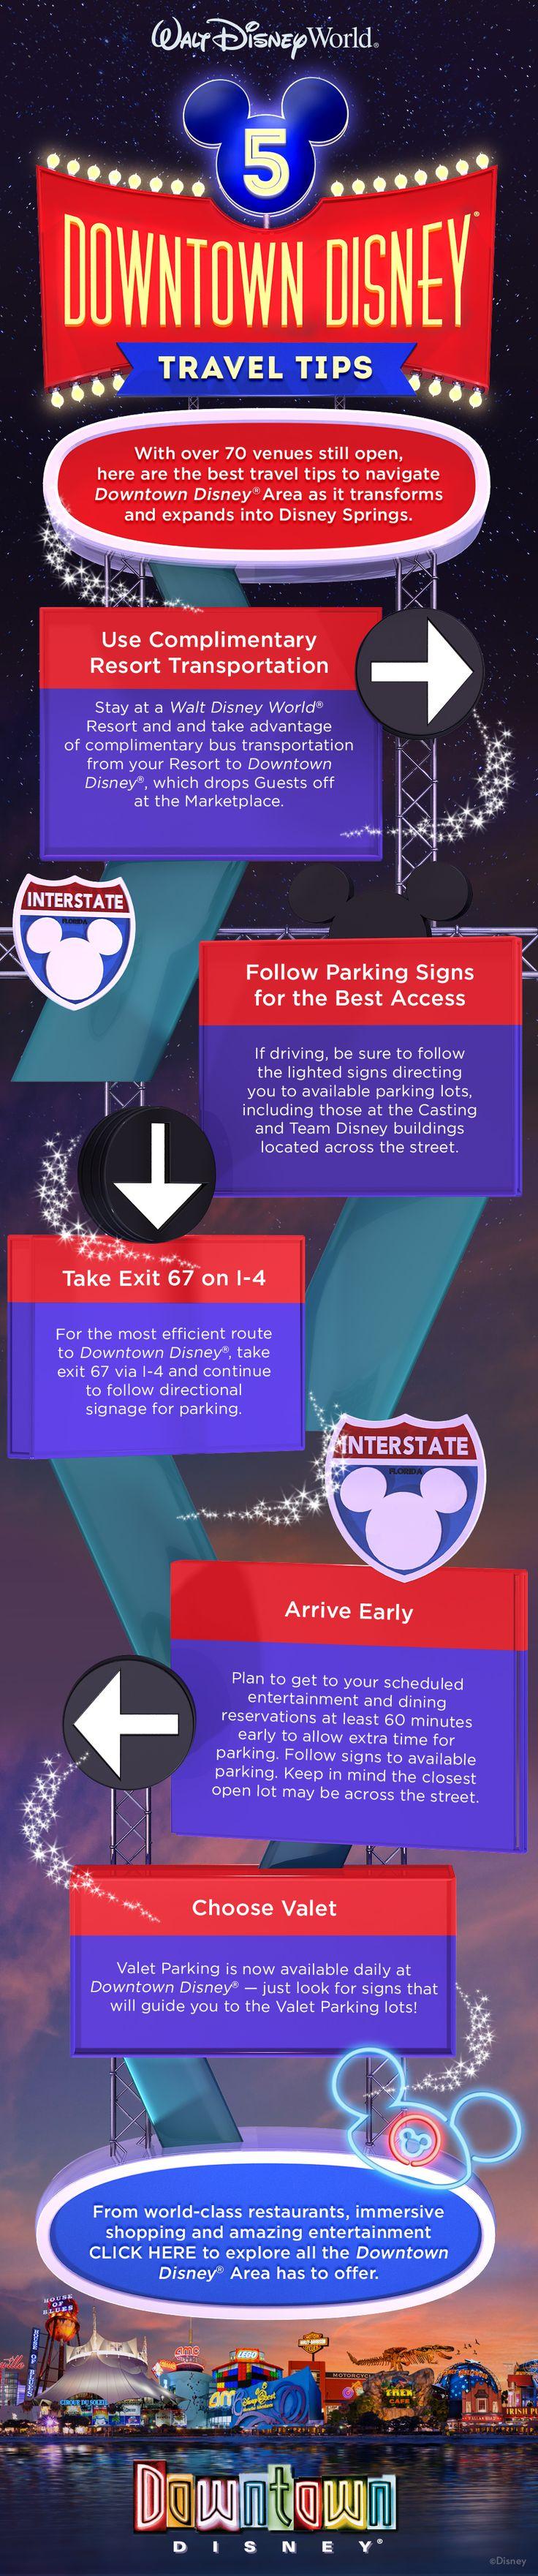 Downtown Disney Travel Tips from Walt Disney World!